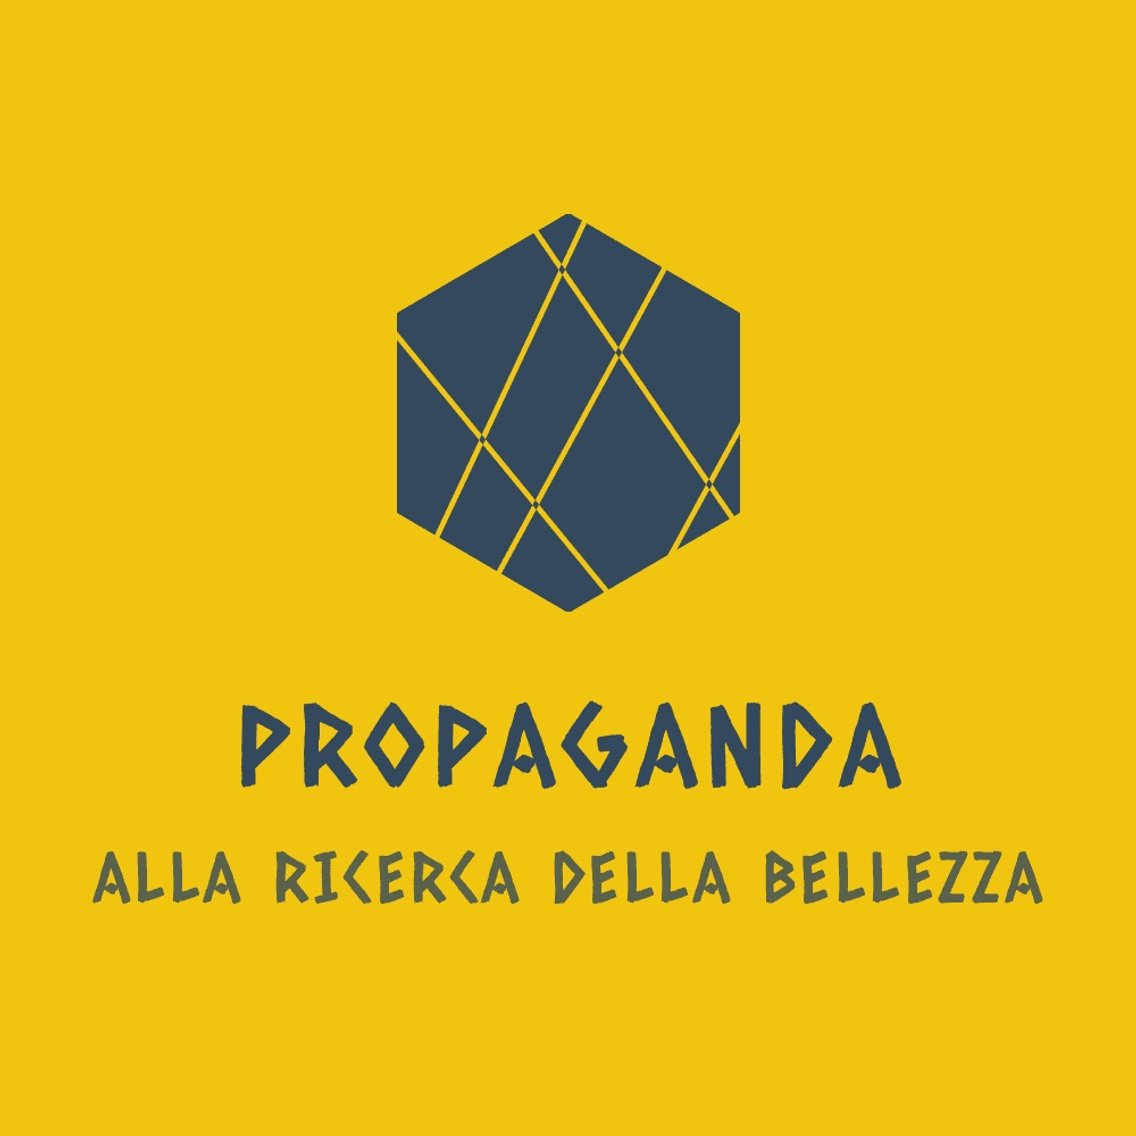 Propaganda - immagine di copertina